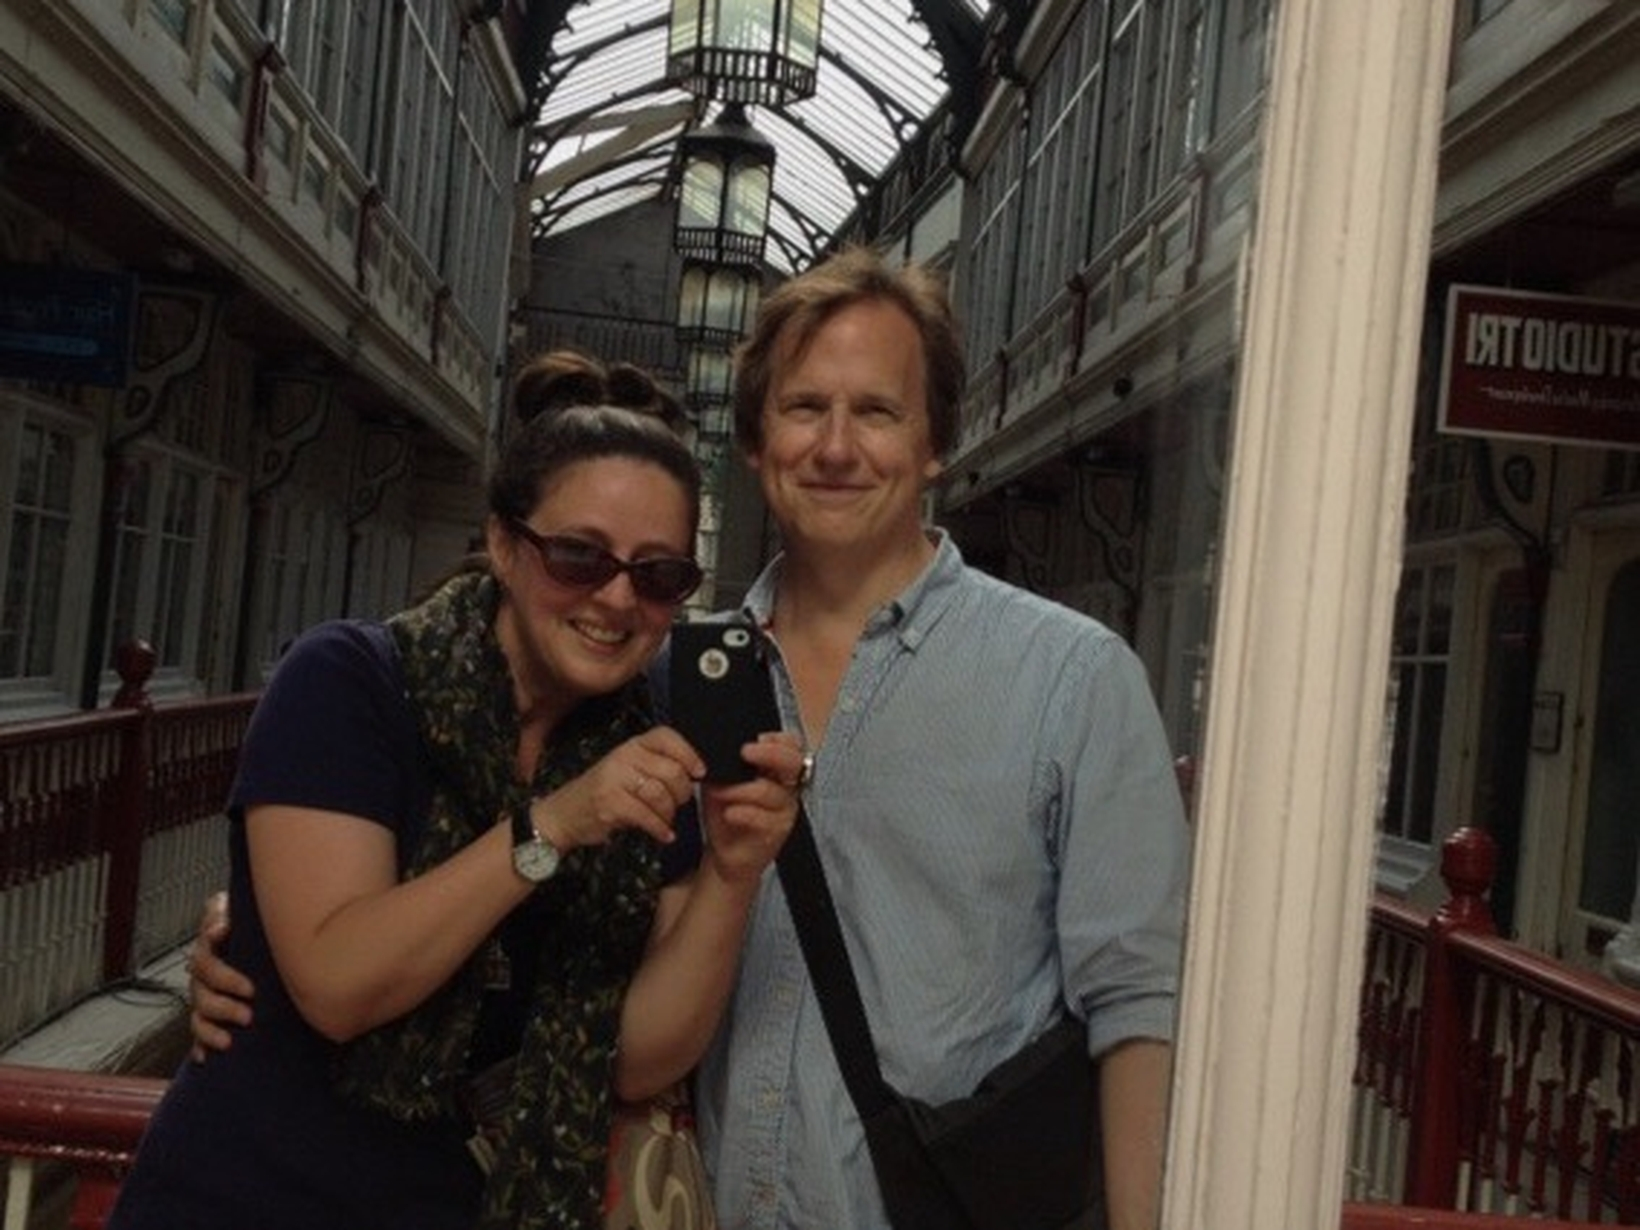 Evy & robert & Robert from Edinburgh, United Kingdom